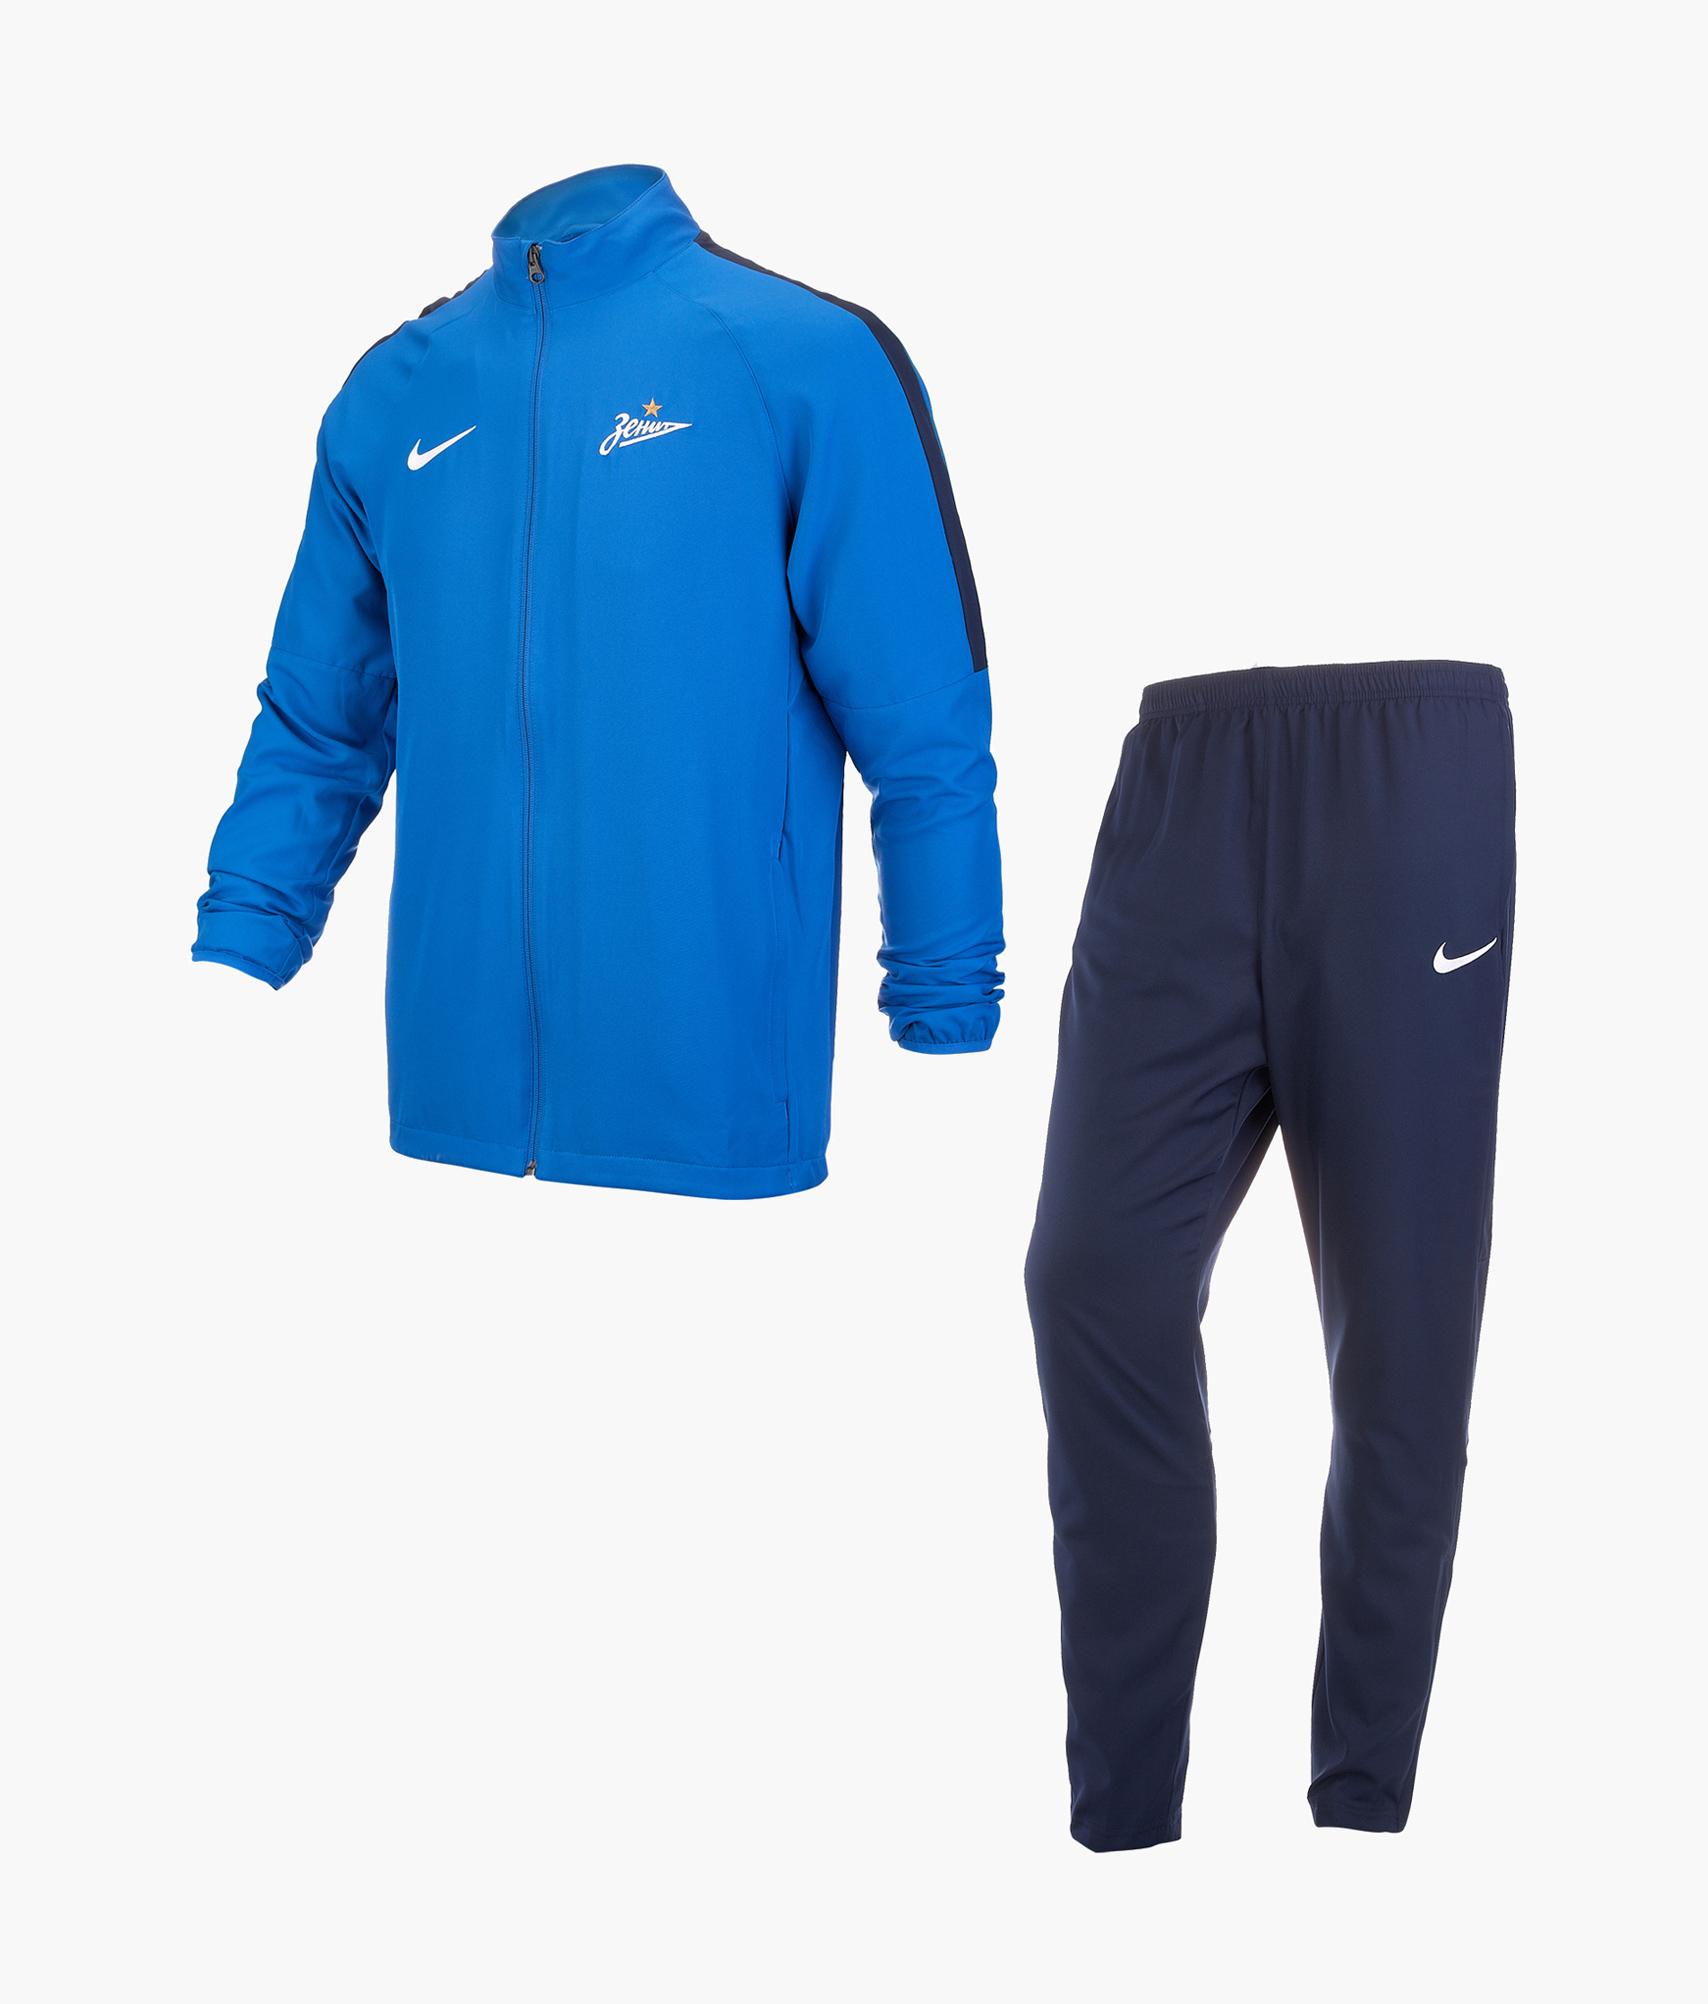 Спортивный костюм мужской Nike Nike Цвет-Синий топ спортивный nike nike ni464ewhtts4